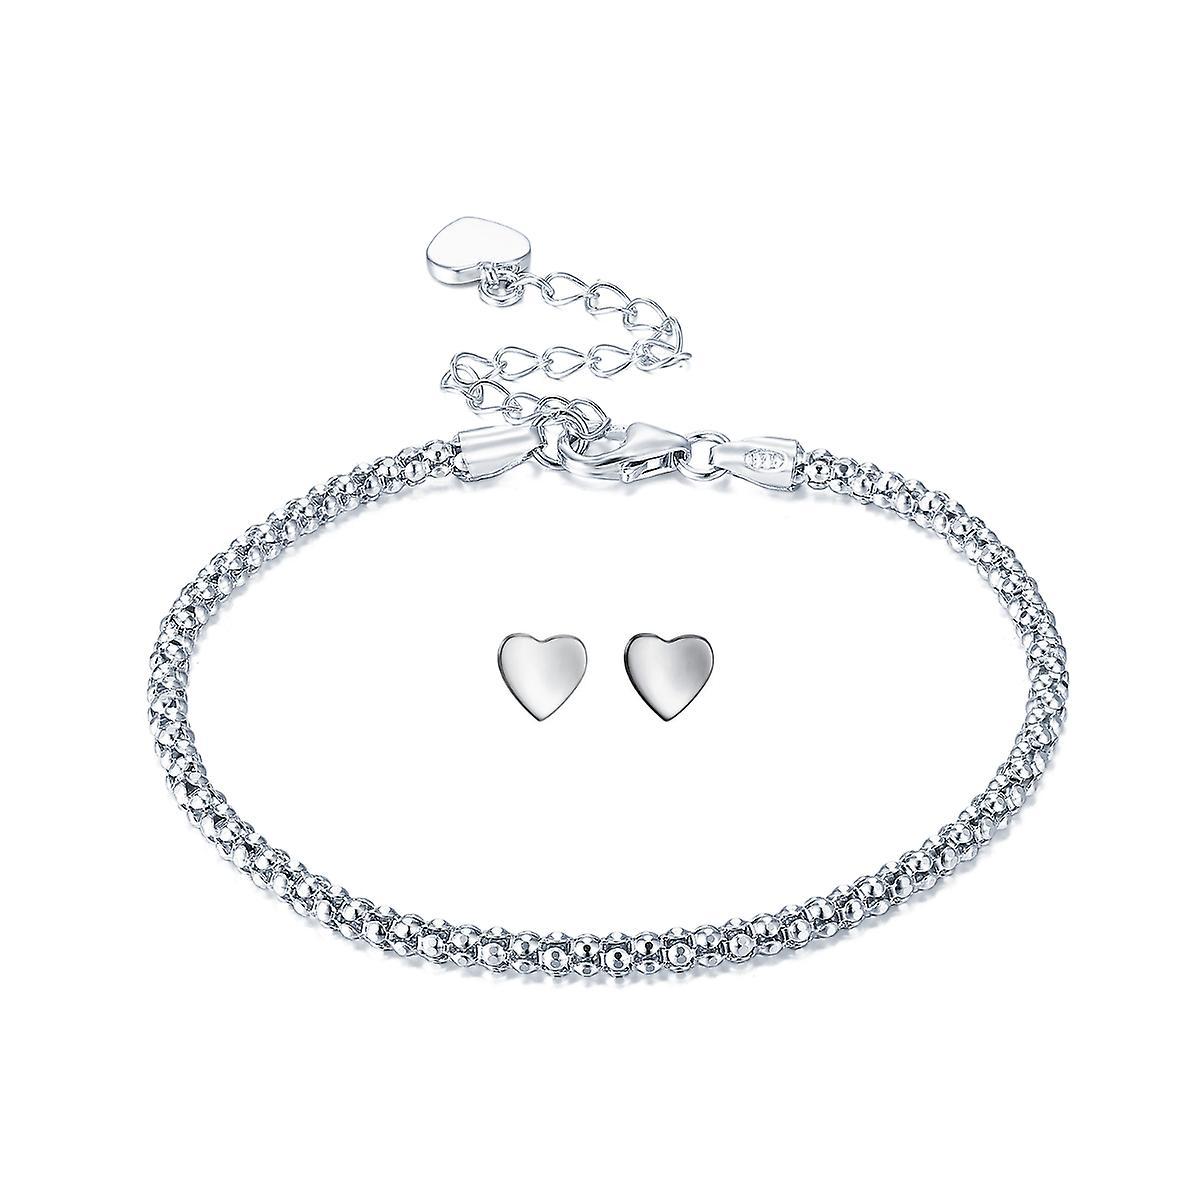 925 Sterling Silver Simple Style Popcorn Bracelet With Studs